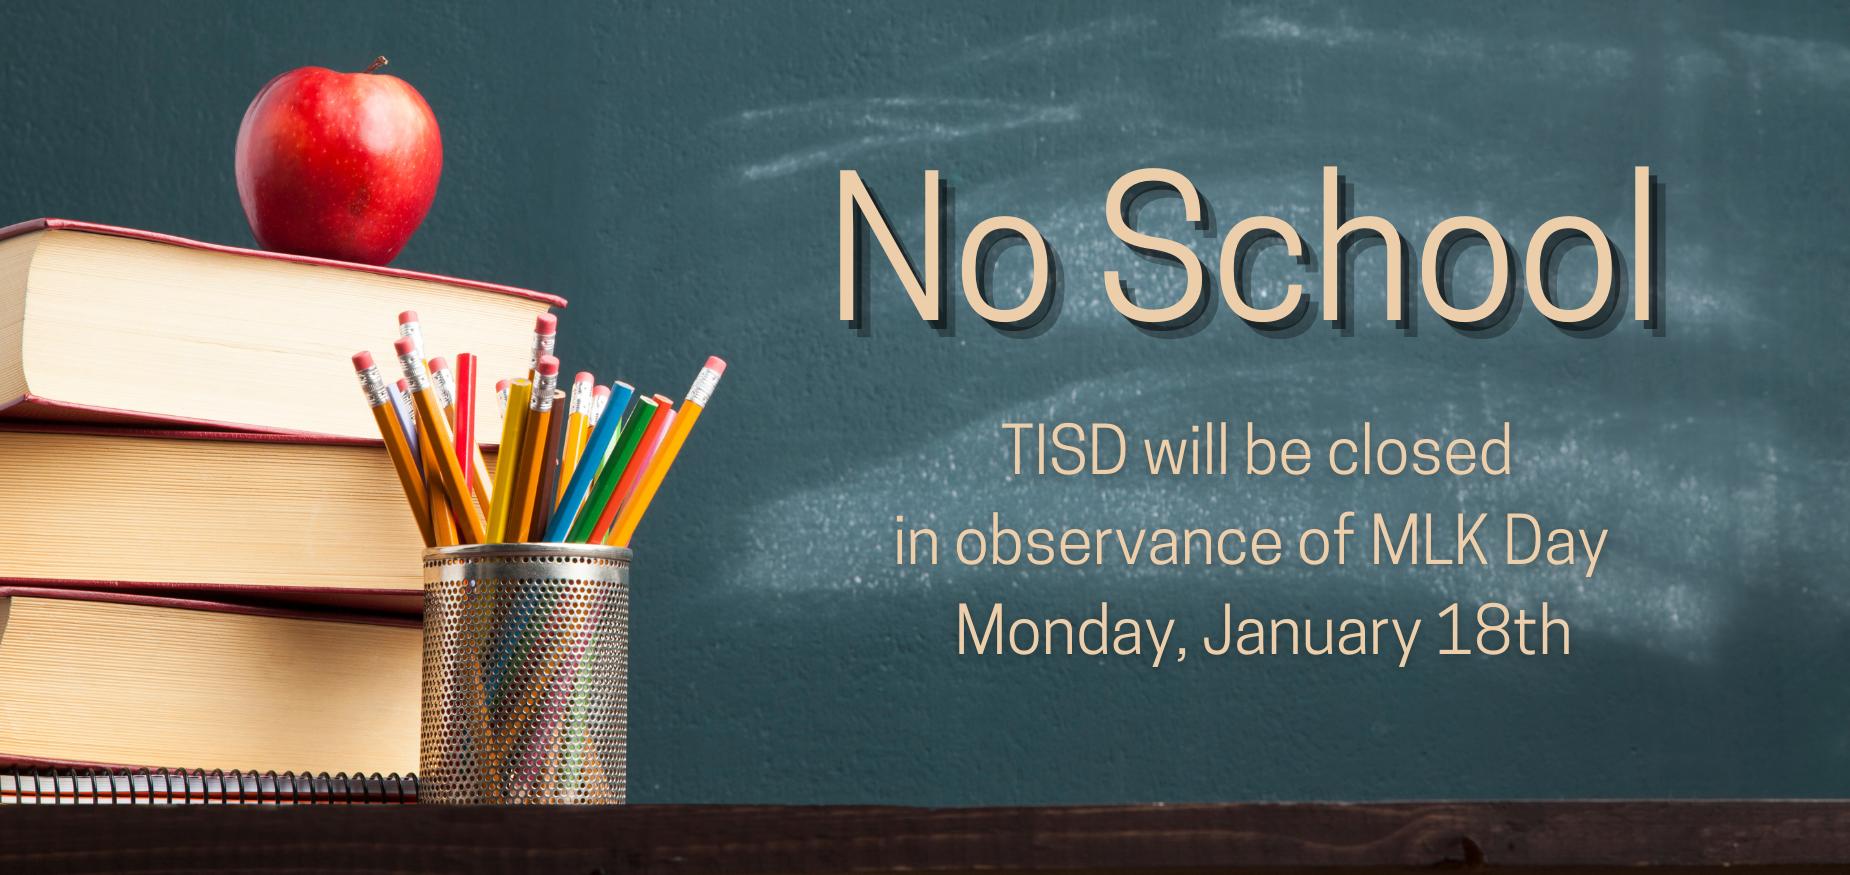 No School January 18th